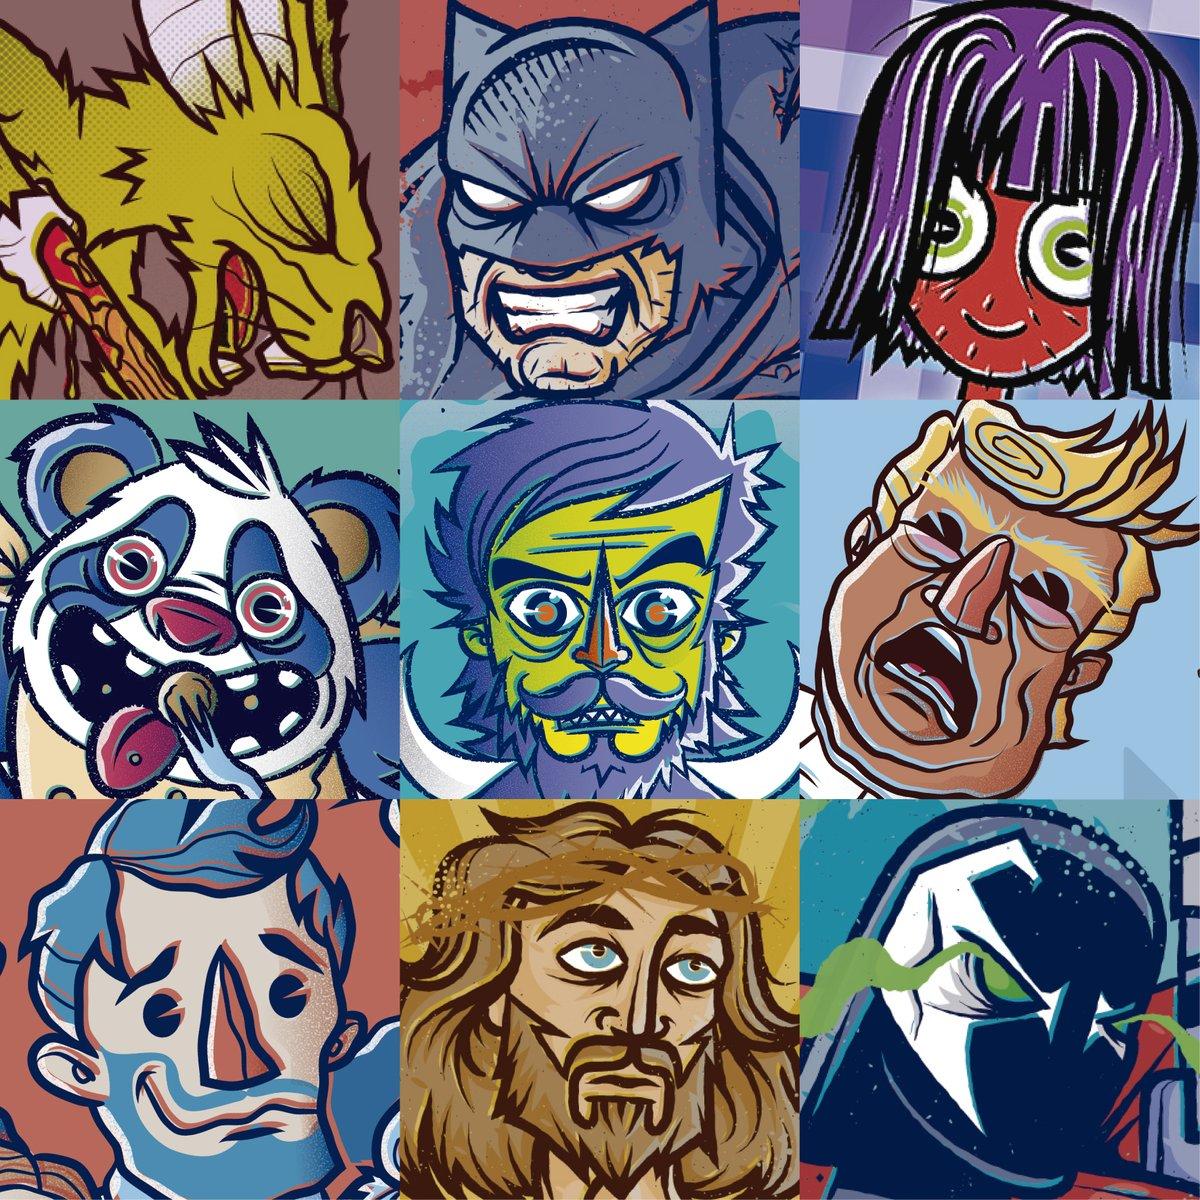 #FaceYourArt l Los Rostros de la Pasión.  #TheMidnightGospel #Batman #Trump #Yisus #Devil #Sapwn #lllustration #ArtistaWacomMexico #Drawing #Cintiq #llustradoresMexicanos #DNNLSMICTO